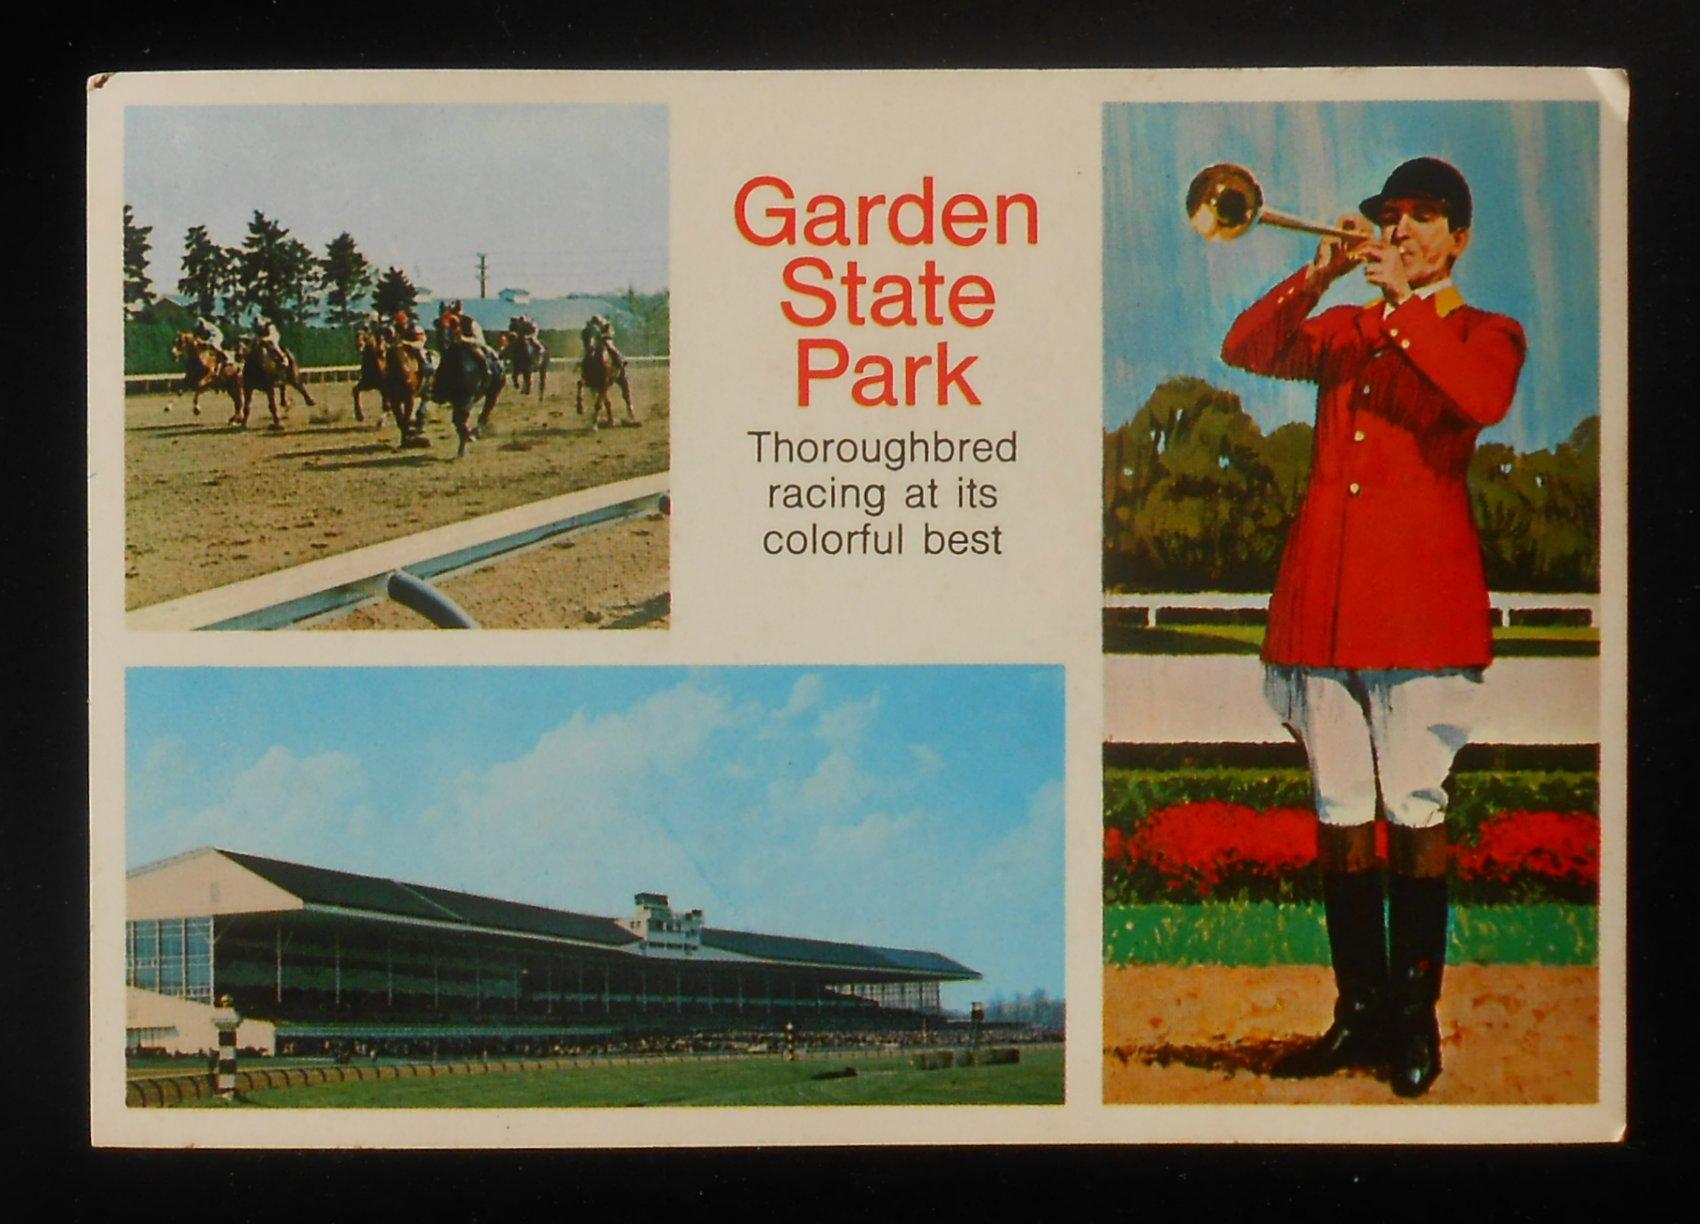 1970s Bulldozed Garden State Park Thoroughbred Racing Grandstand Cherry Hill Nj Ebay